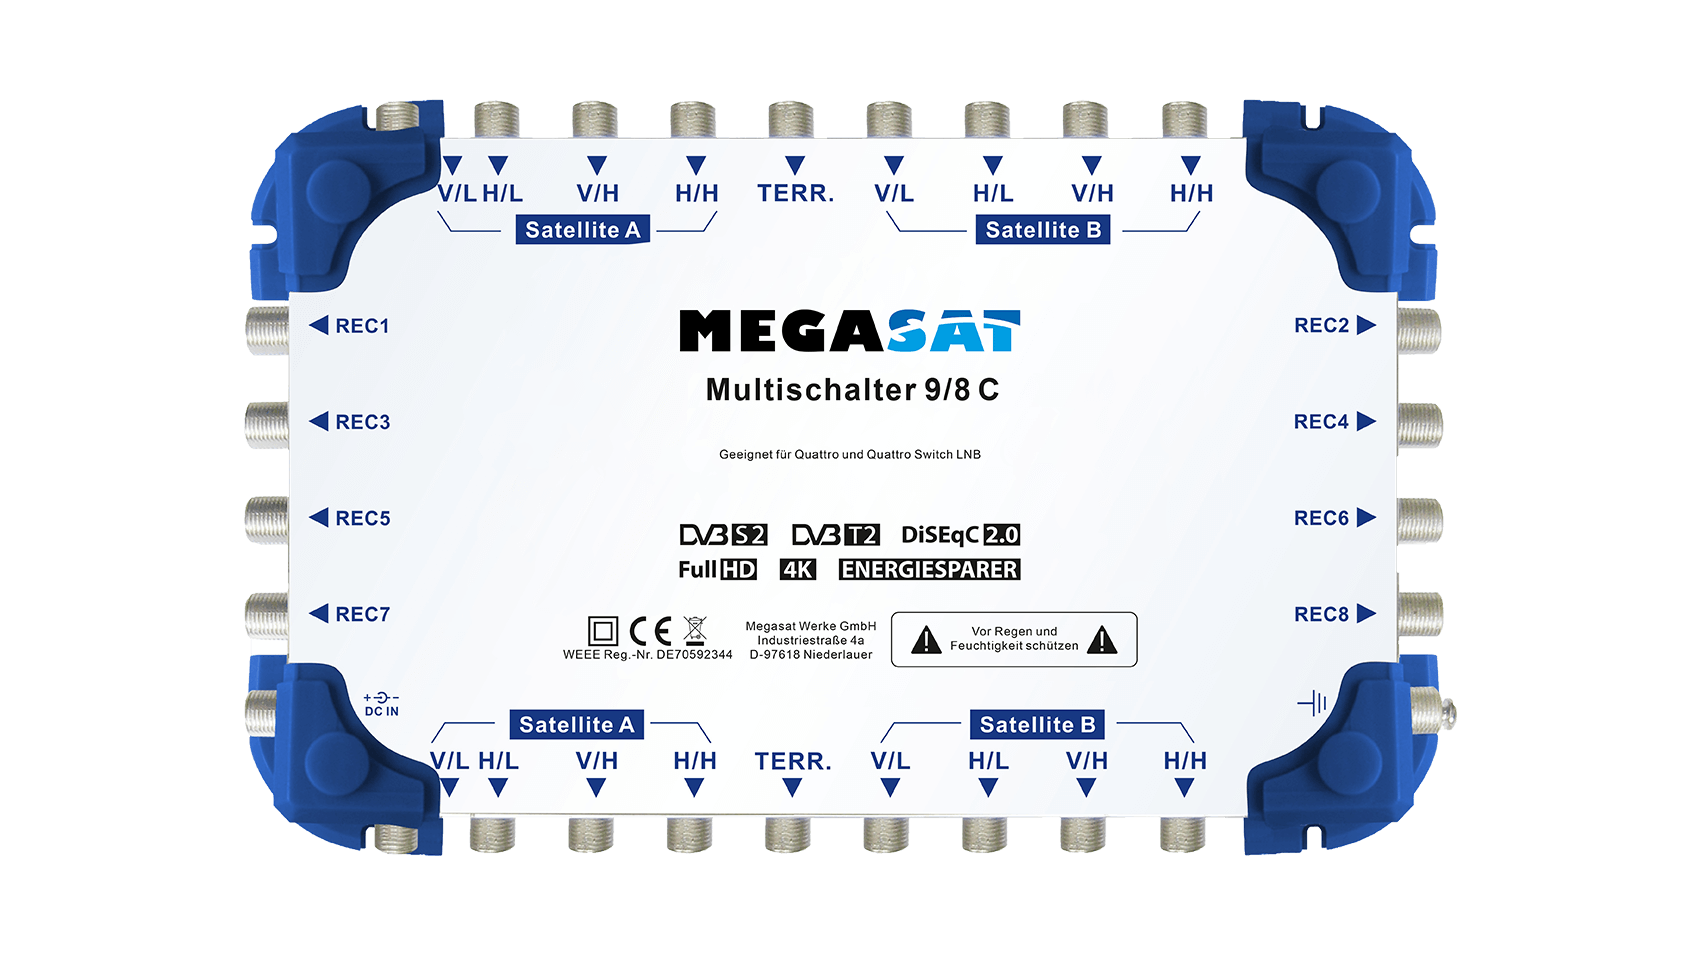 megasat_multischalter_9_8_c_frontansicht